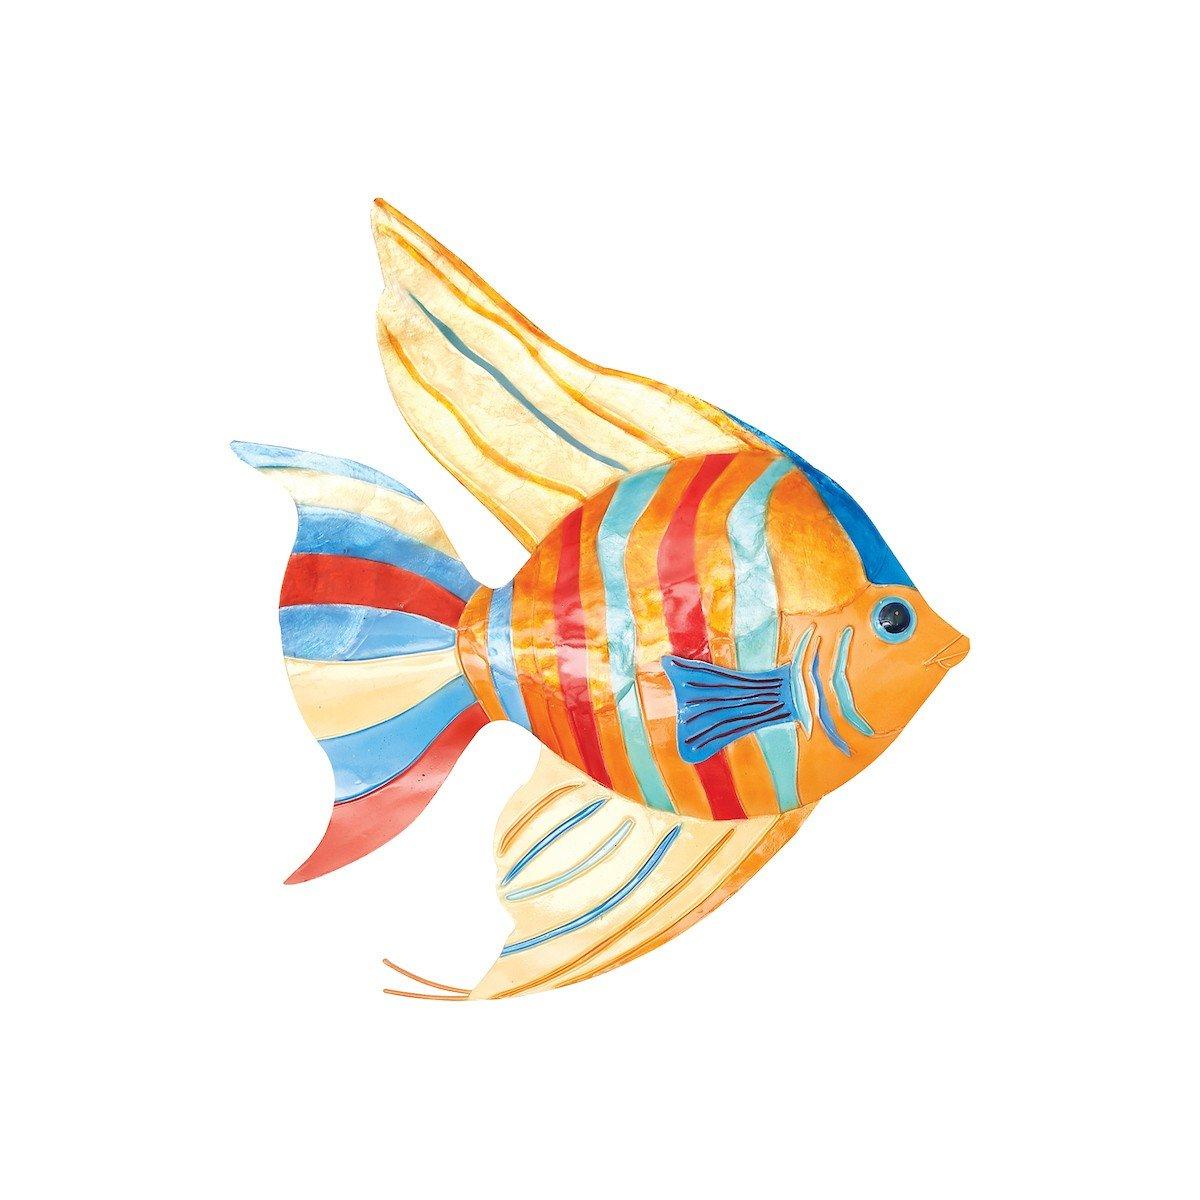 GALLERIE II Bimini Island Tropical Coastal Fish Wall Art